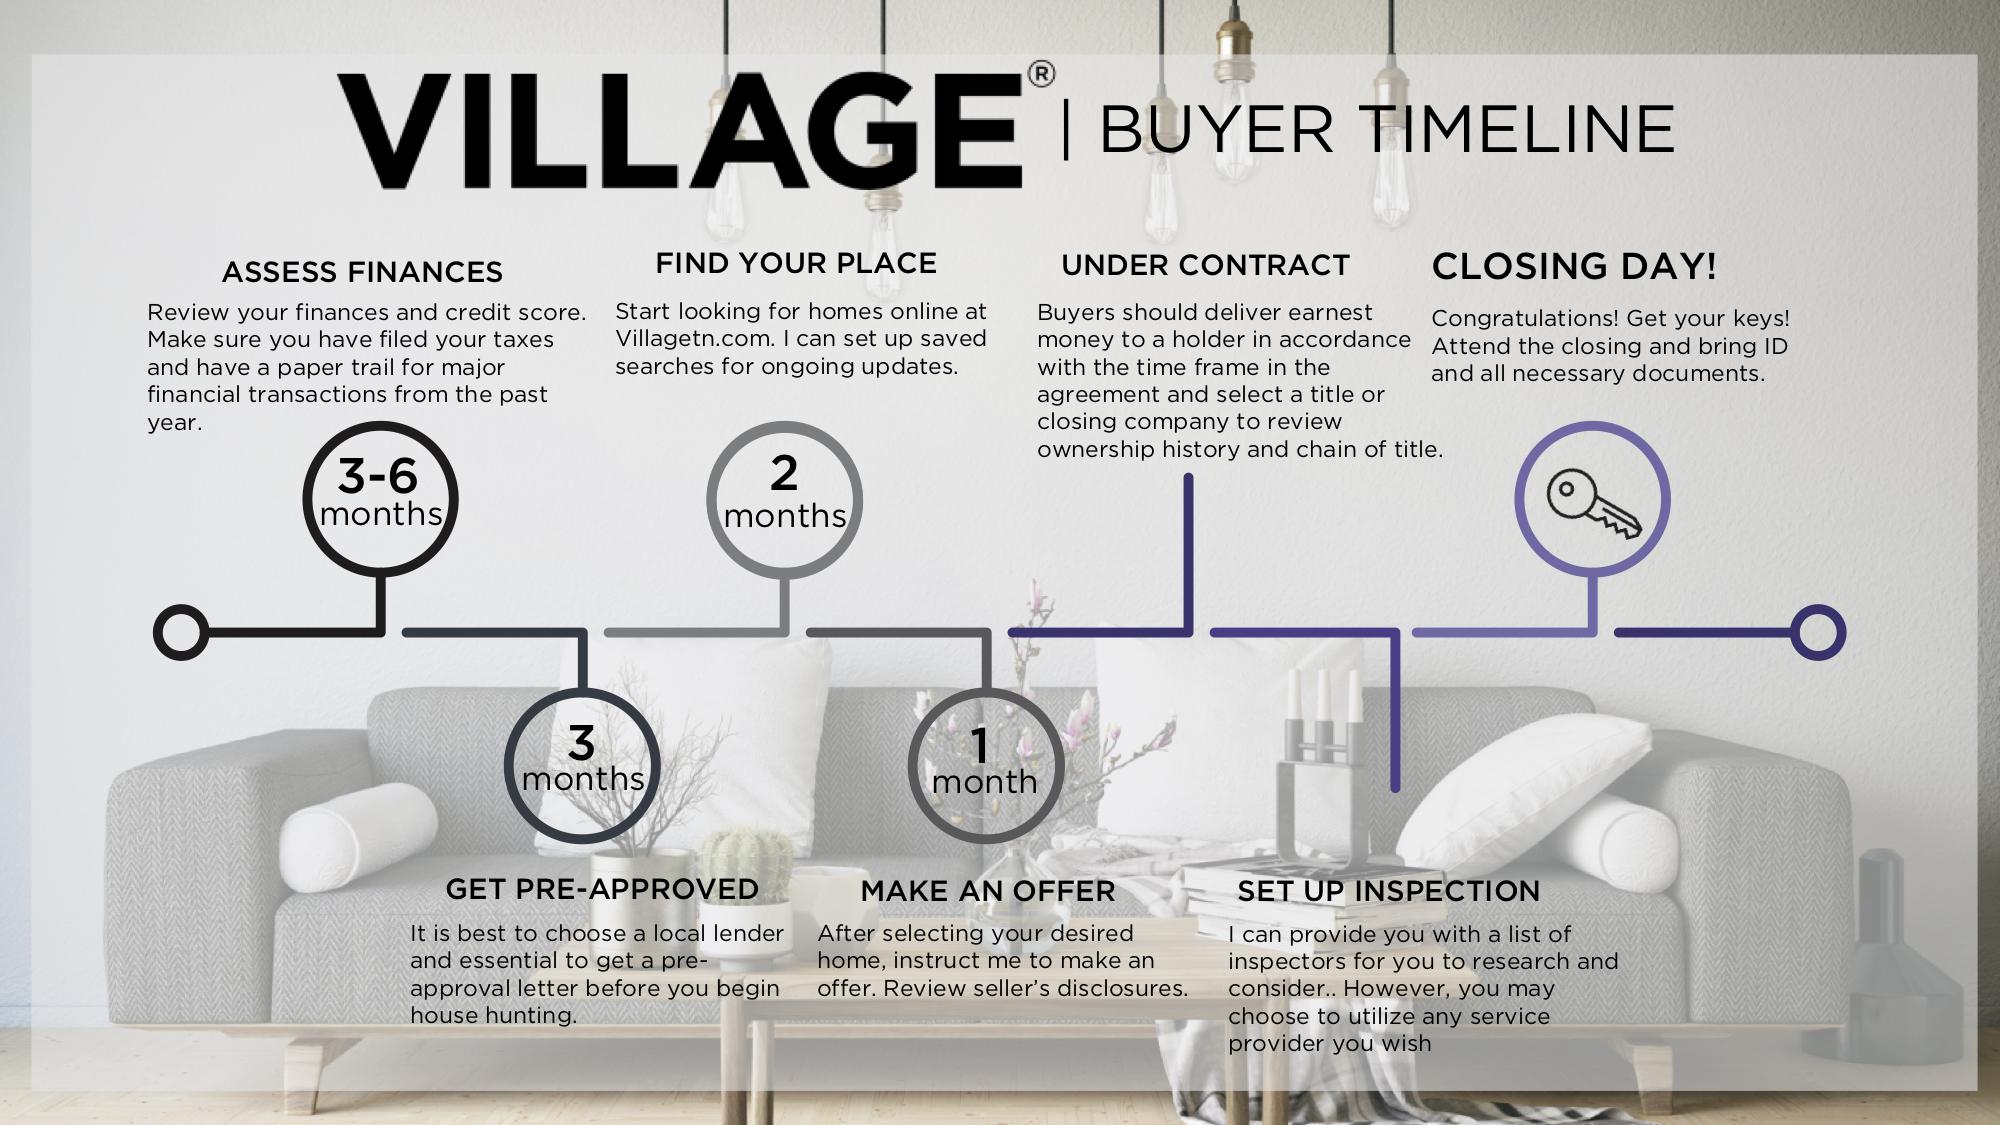 Buyer Timeline